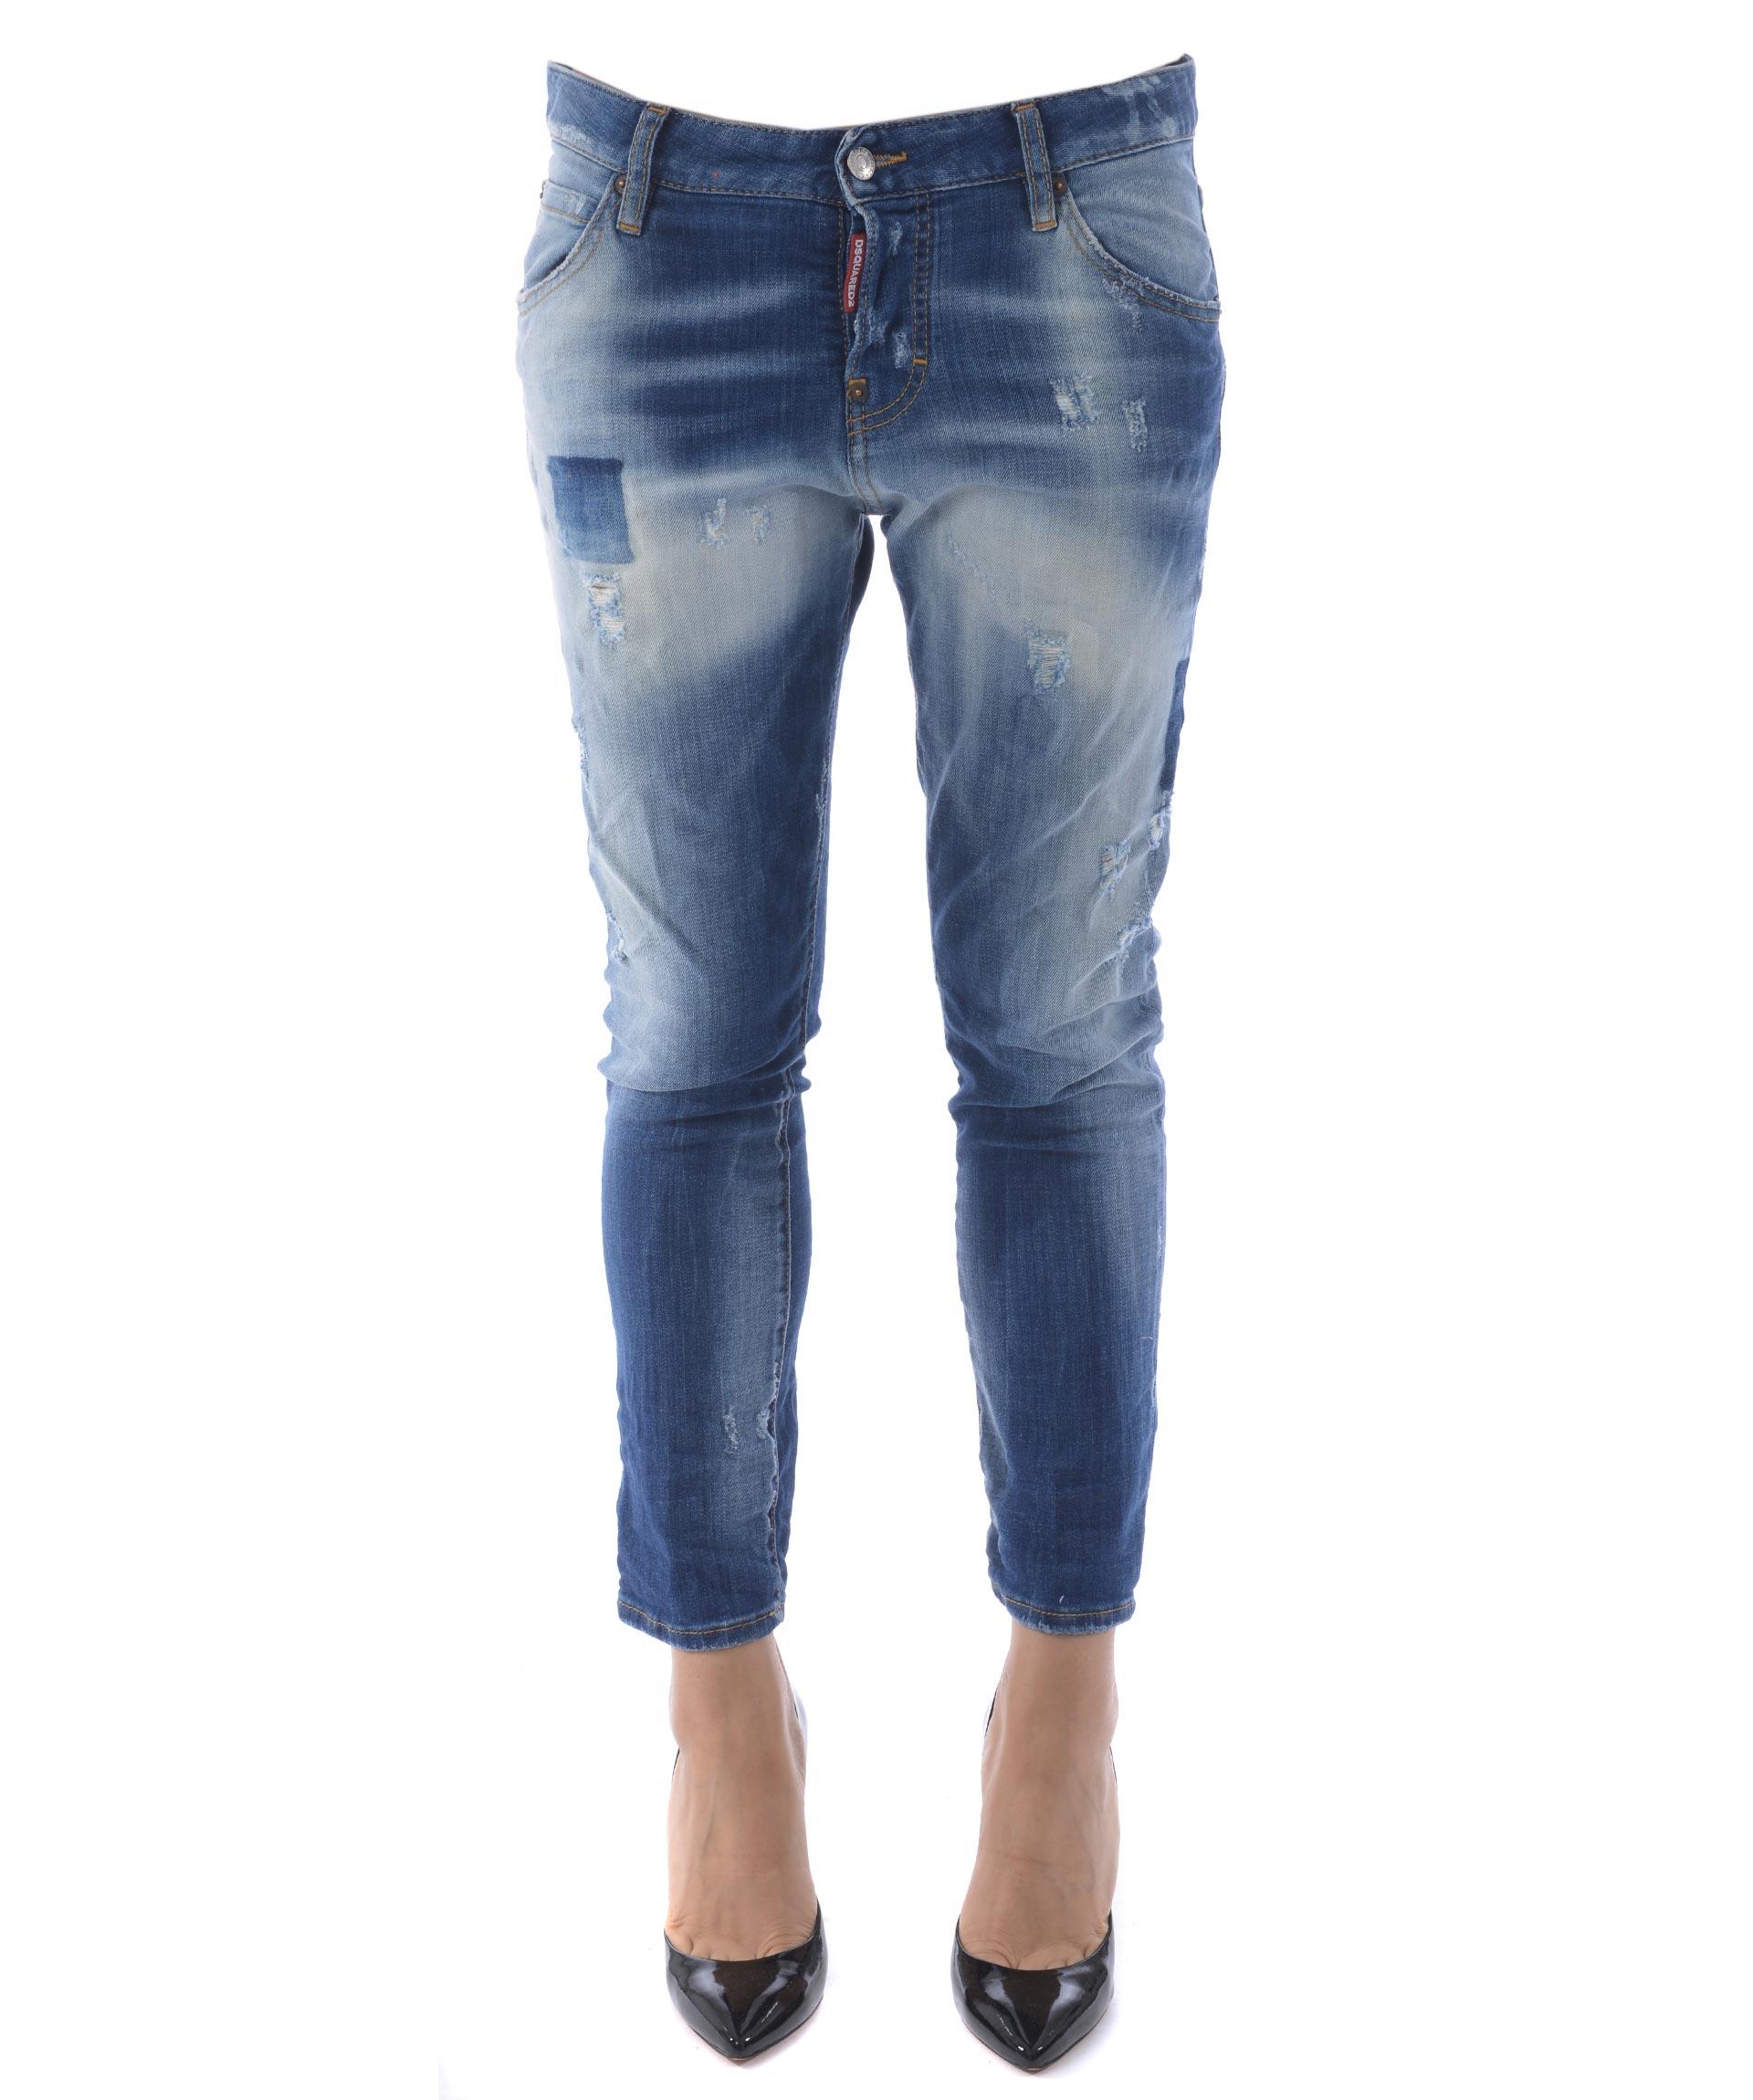 Jeans - DSQUARED - TufanoModa 0836194bfd2c